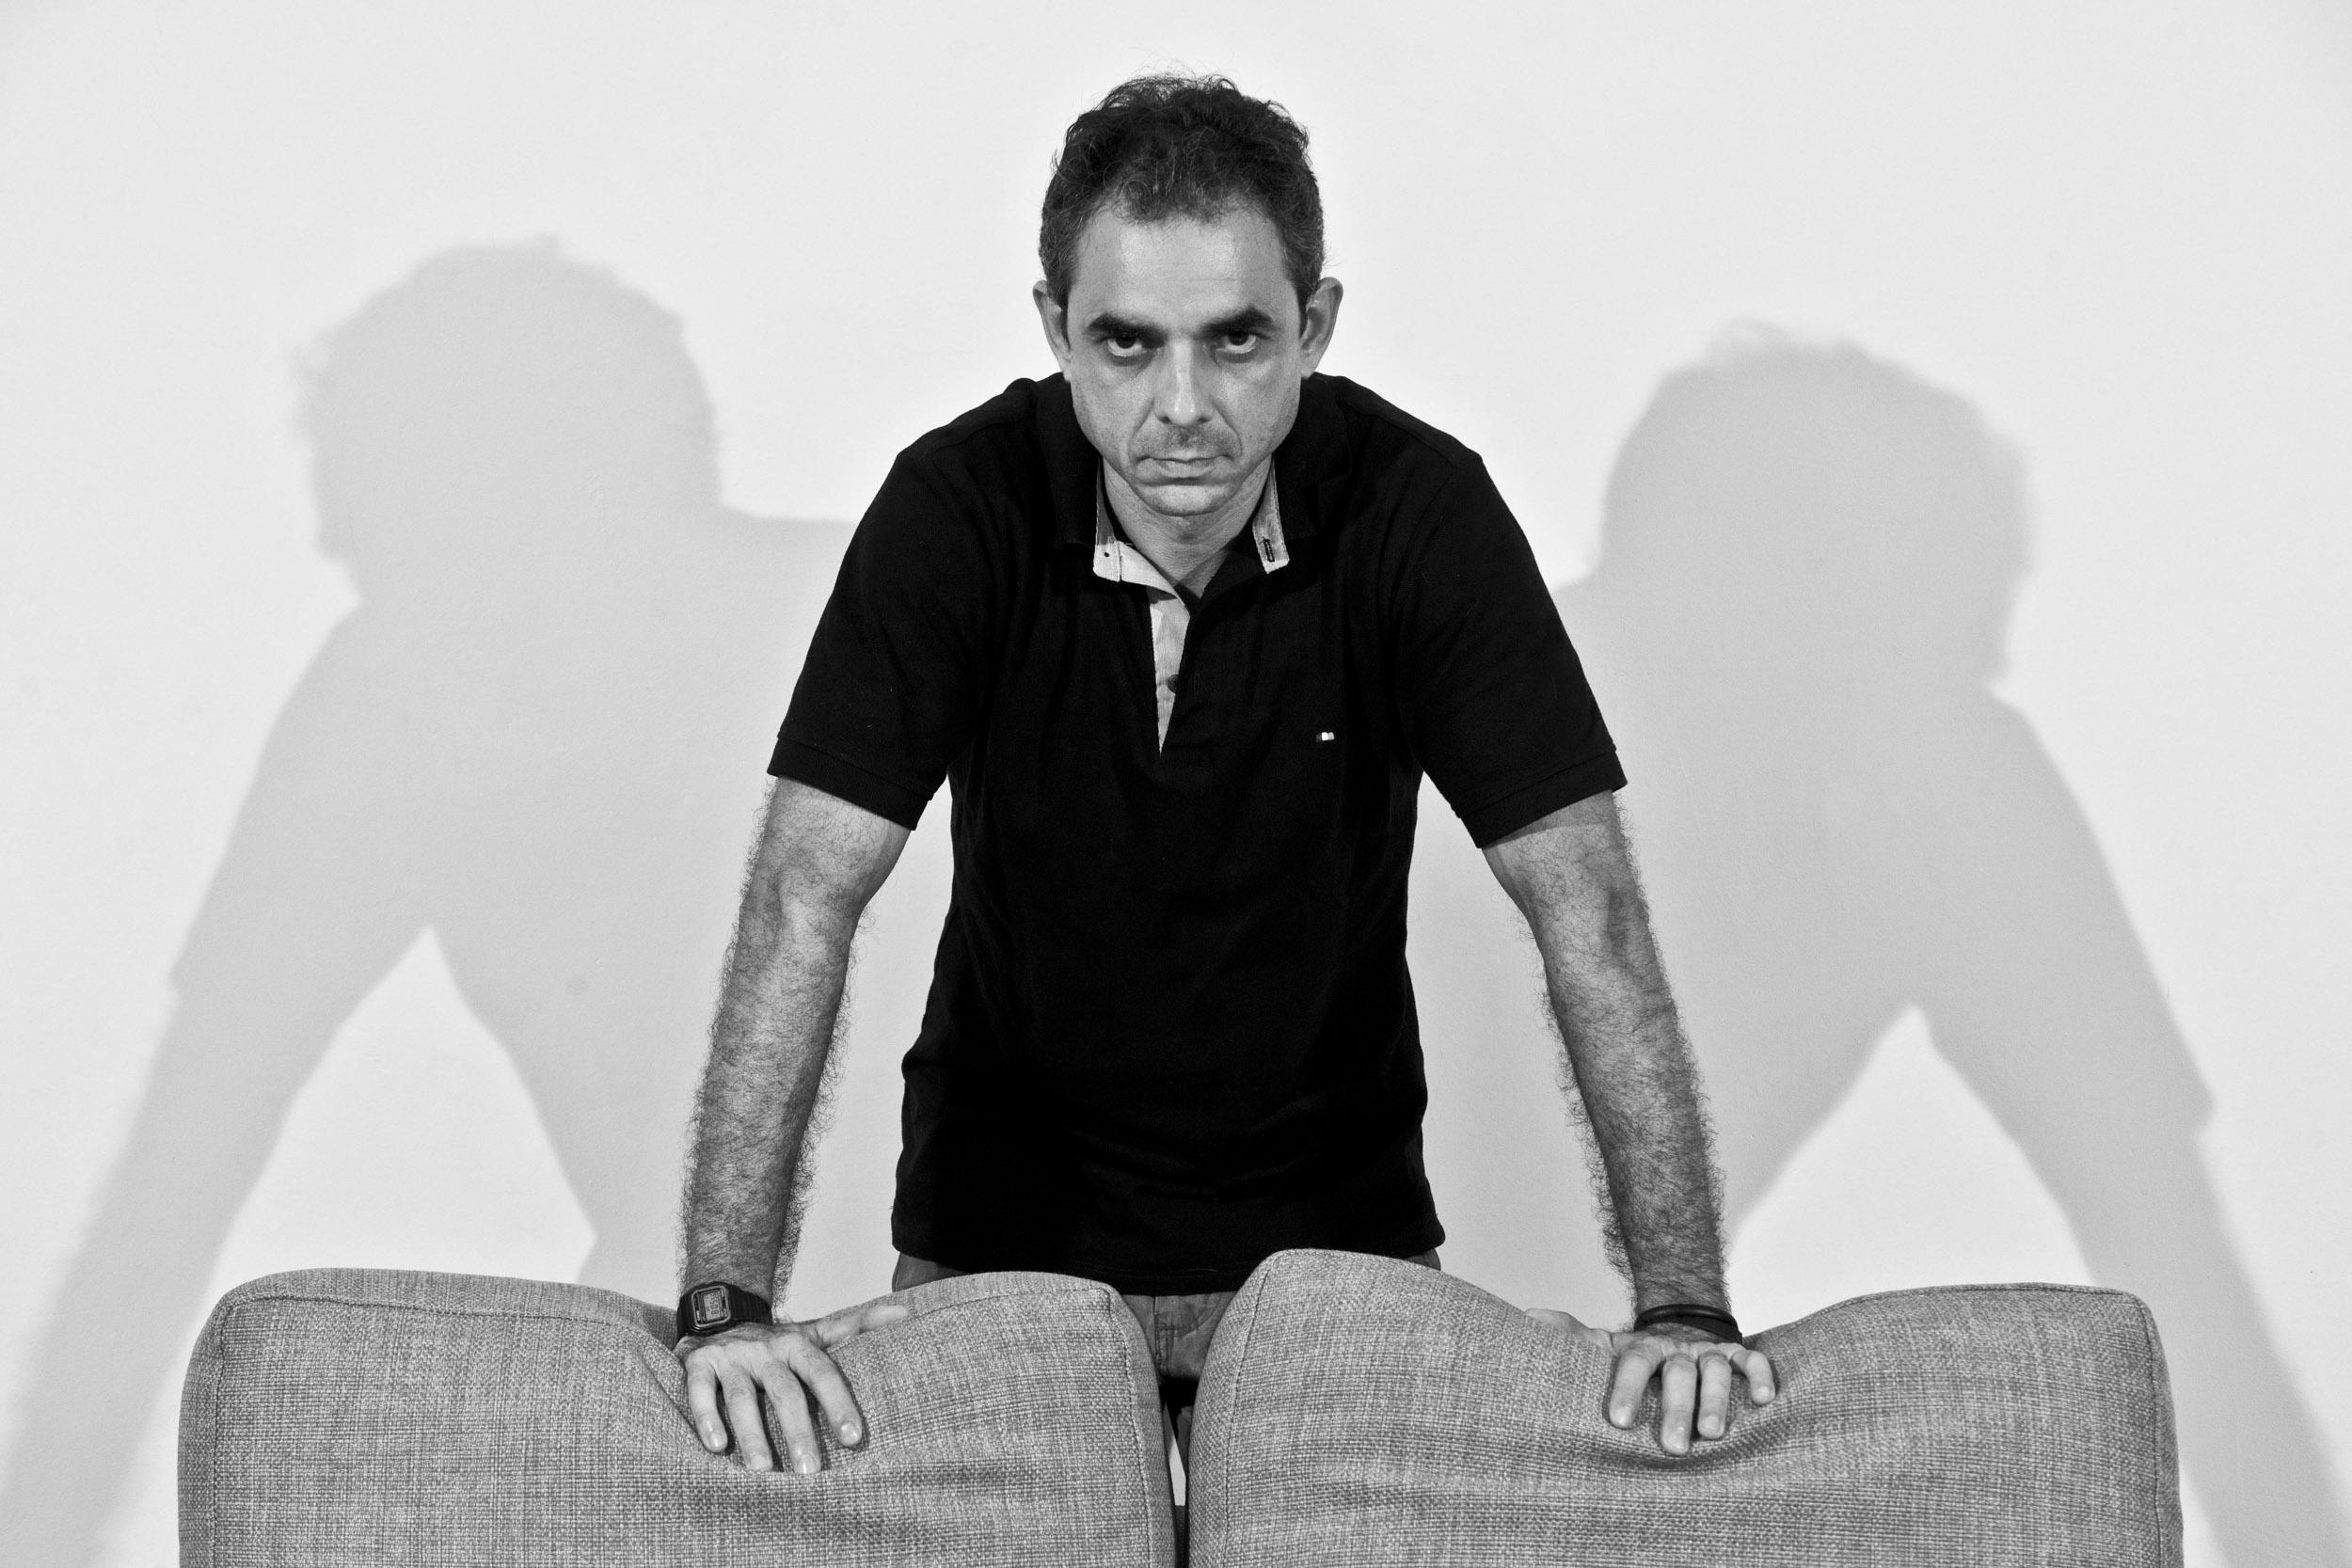 Ernesto Sierra, writer - Illuminated Cuba - Hector Garrido, Aerial and human photography